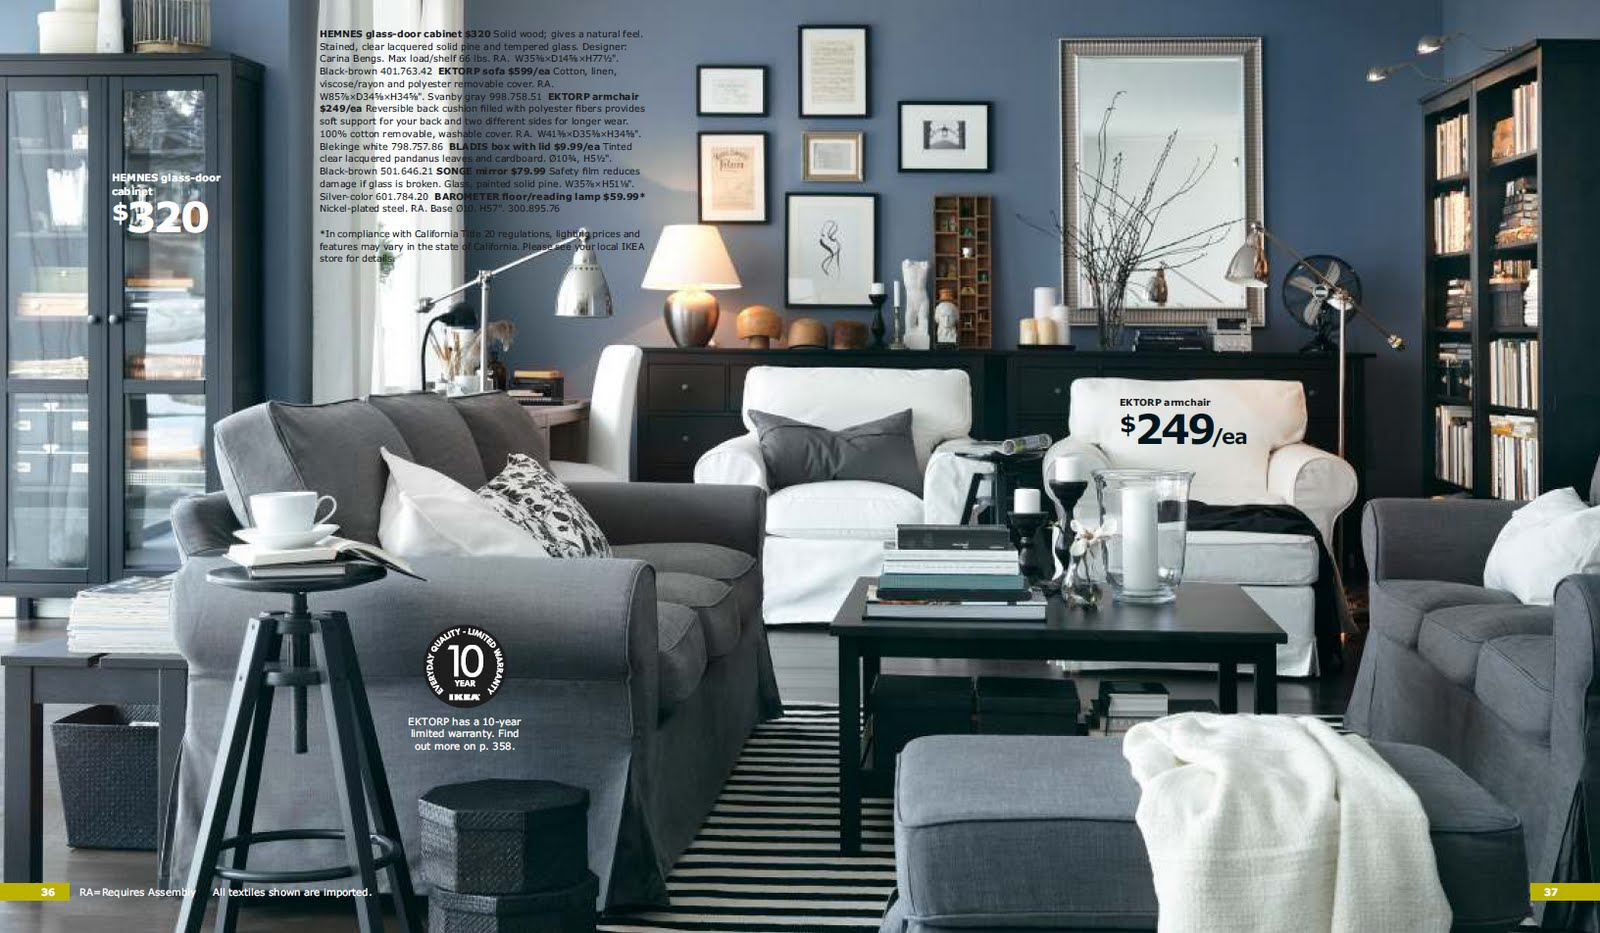 ikea 2012 catalogue | costin m